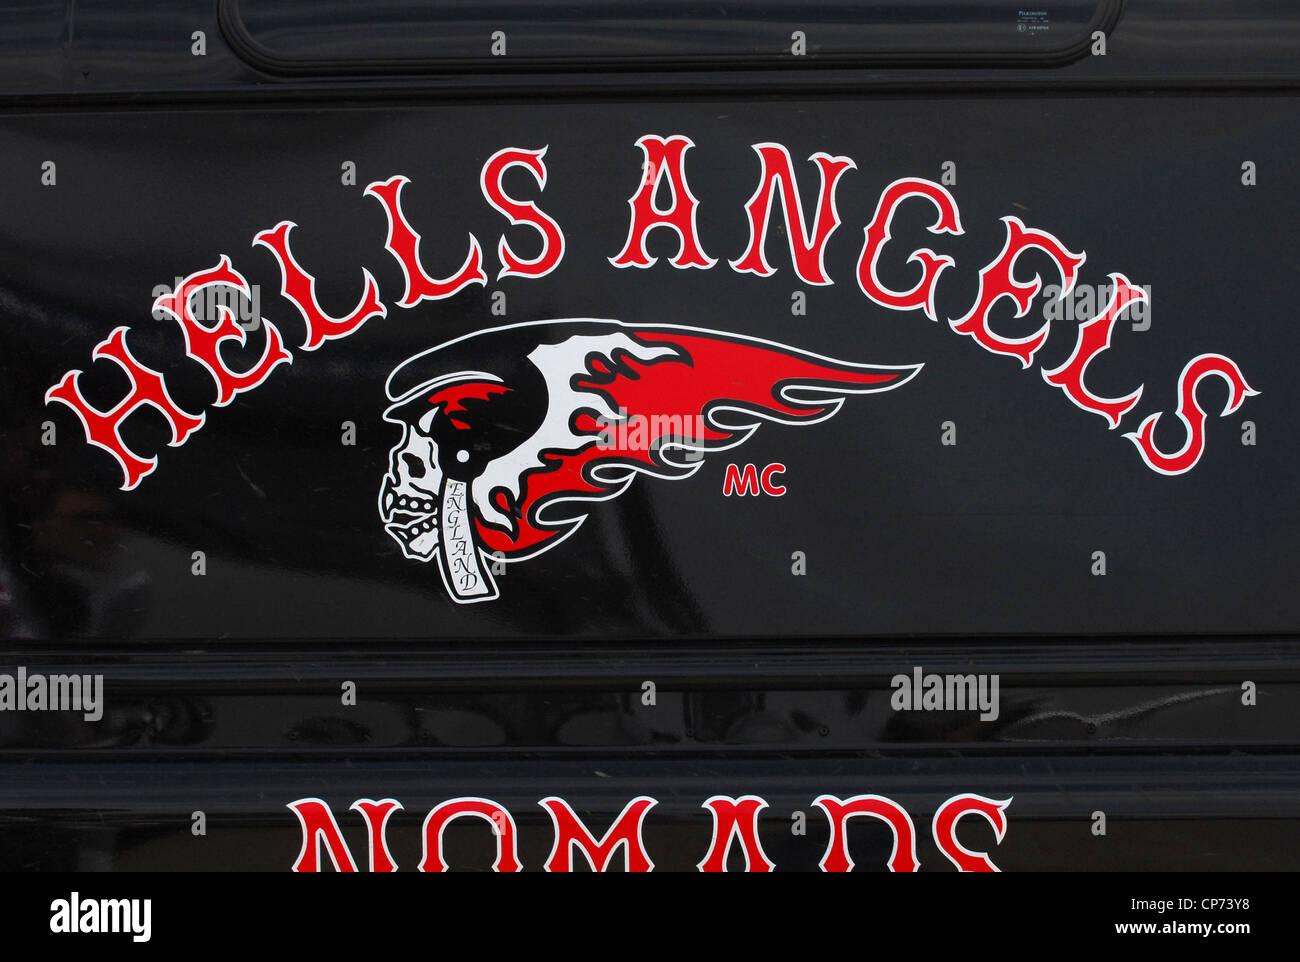 """Hells Angels"" or ""Hells Angels Motorcycle Club"" Logo on the Side of a Van. Stock Photo"